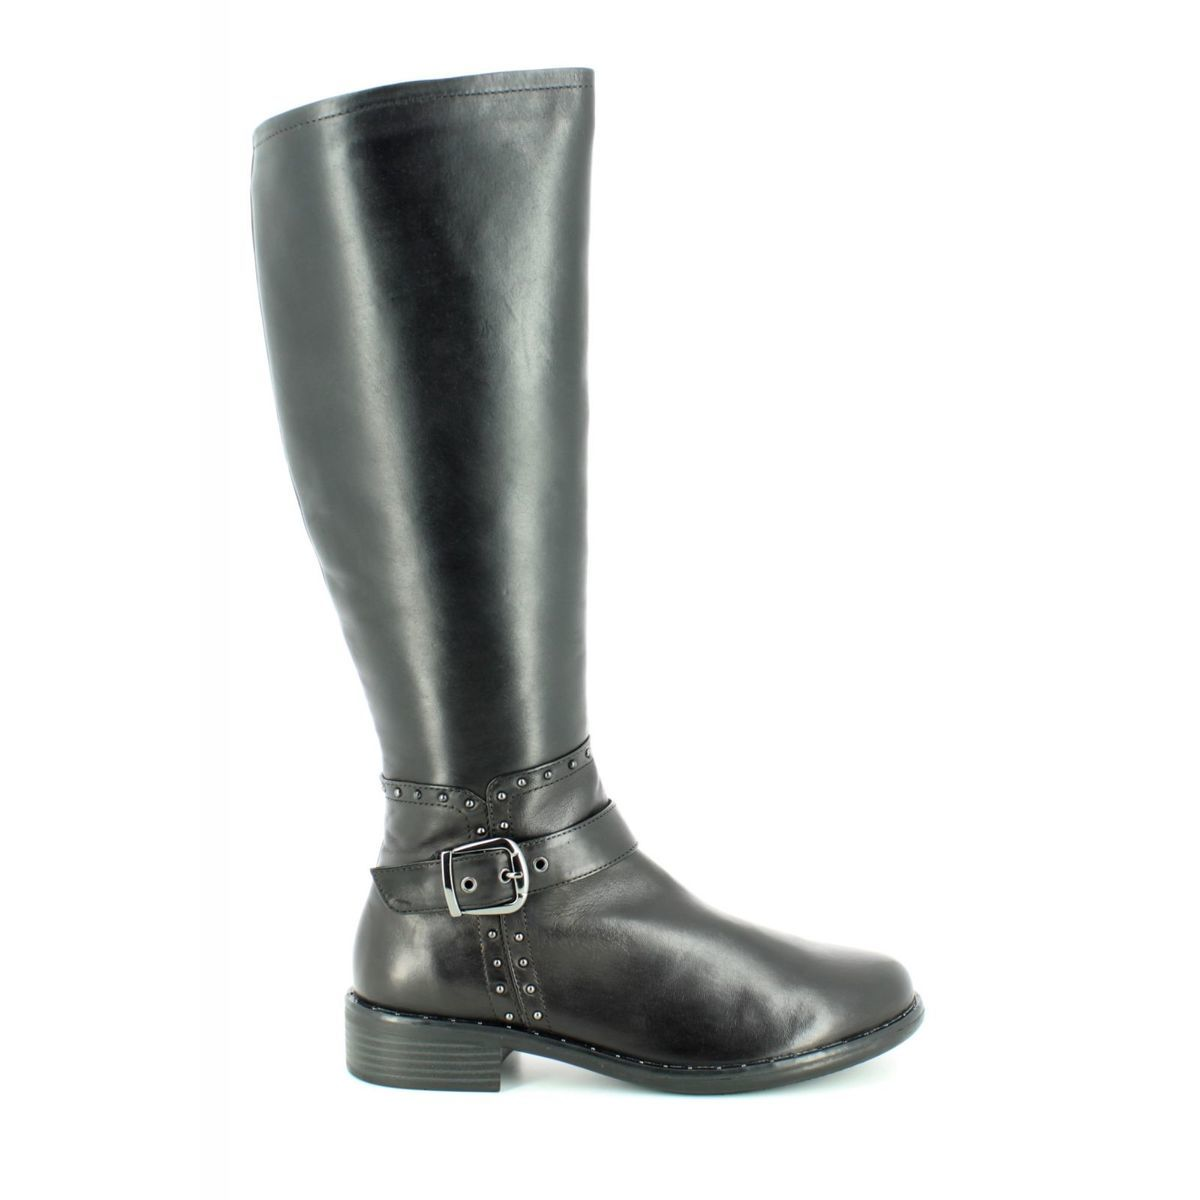 977ced40 Regarde le Ciel Knee-high Boots - Black leather - 2695/40 ROXANA 07